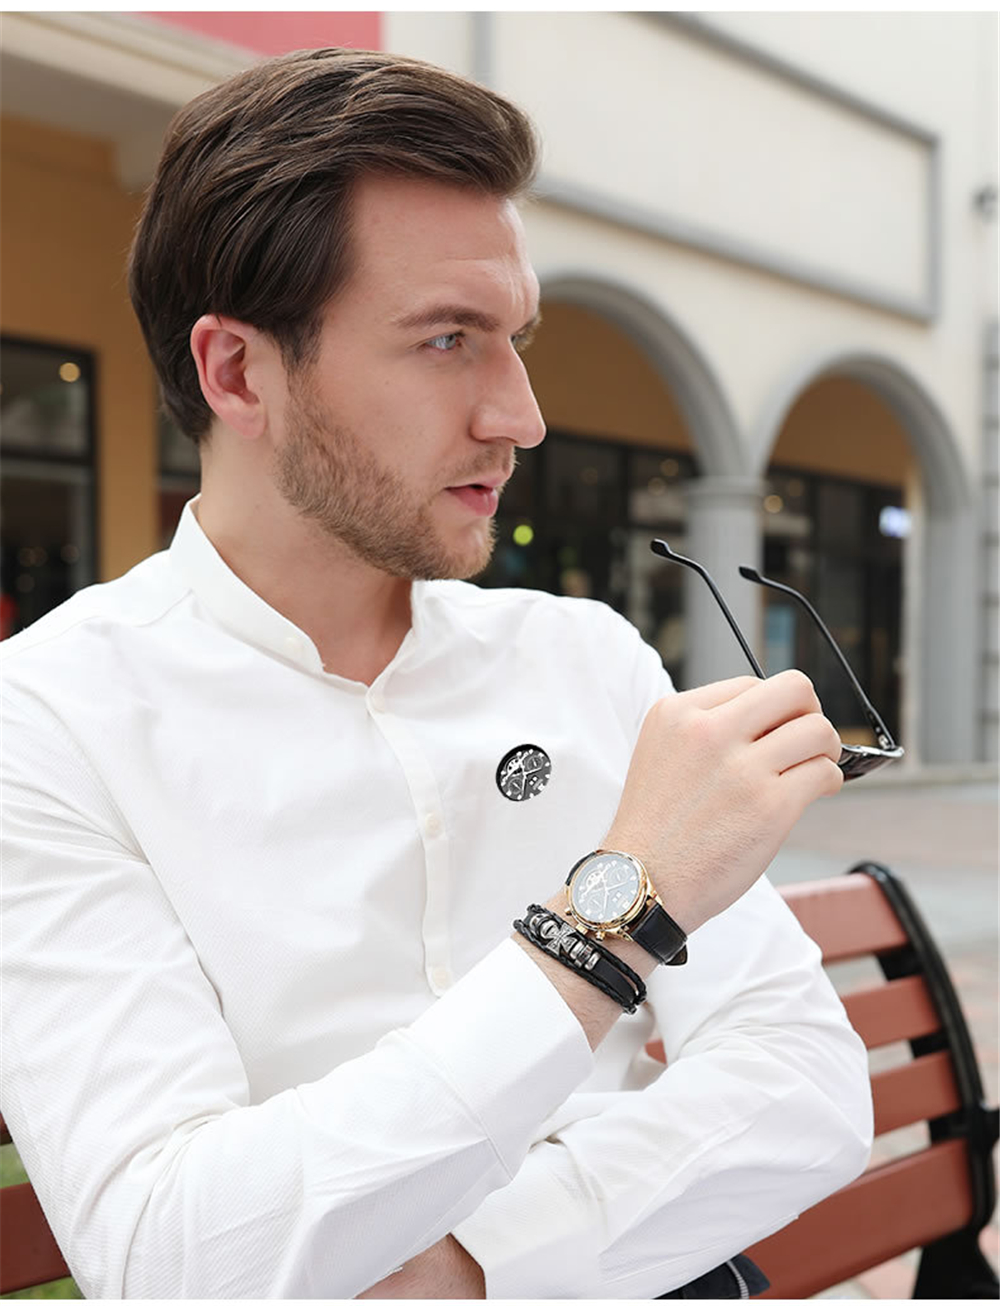 HTB1vupiXOYrK1Rjy0Fdq6ACvVXaE HAIQIN Men's watches Automatic mechanical Men Watches Business Watch men top brand luxury Military Waterproof Tourbillon Clock